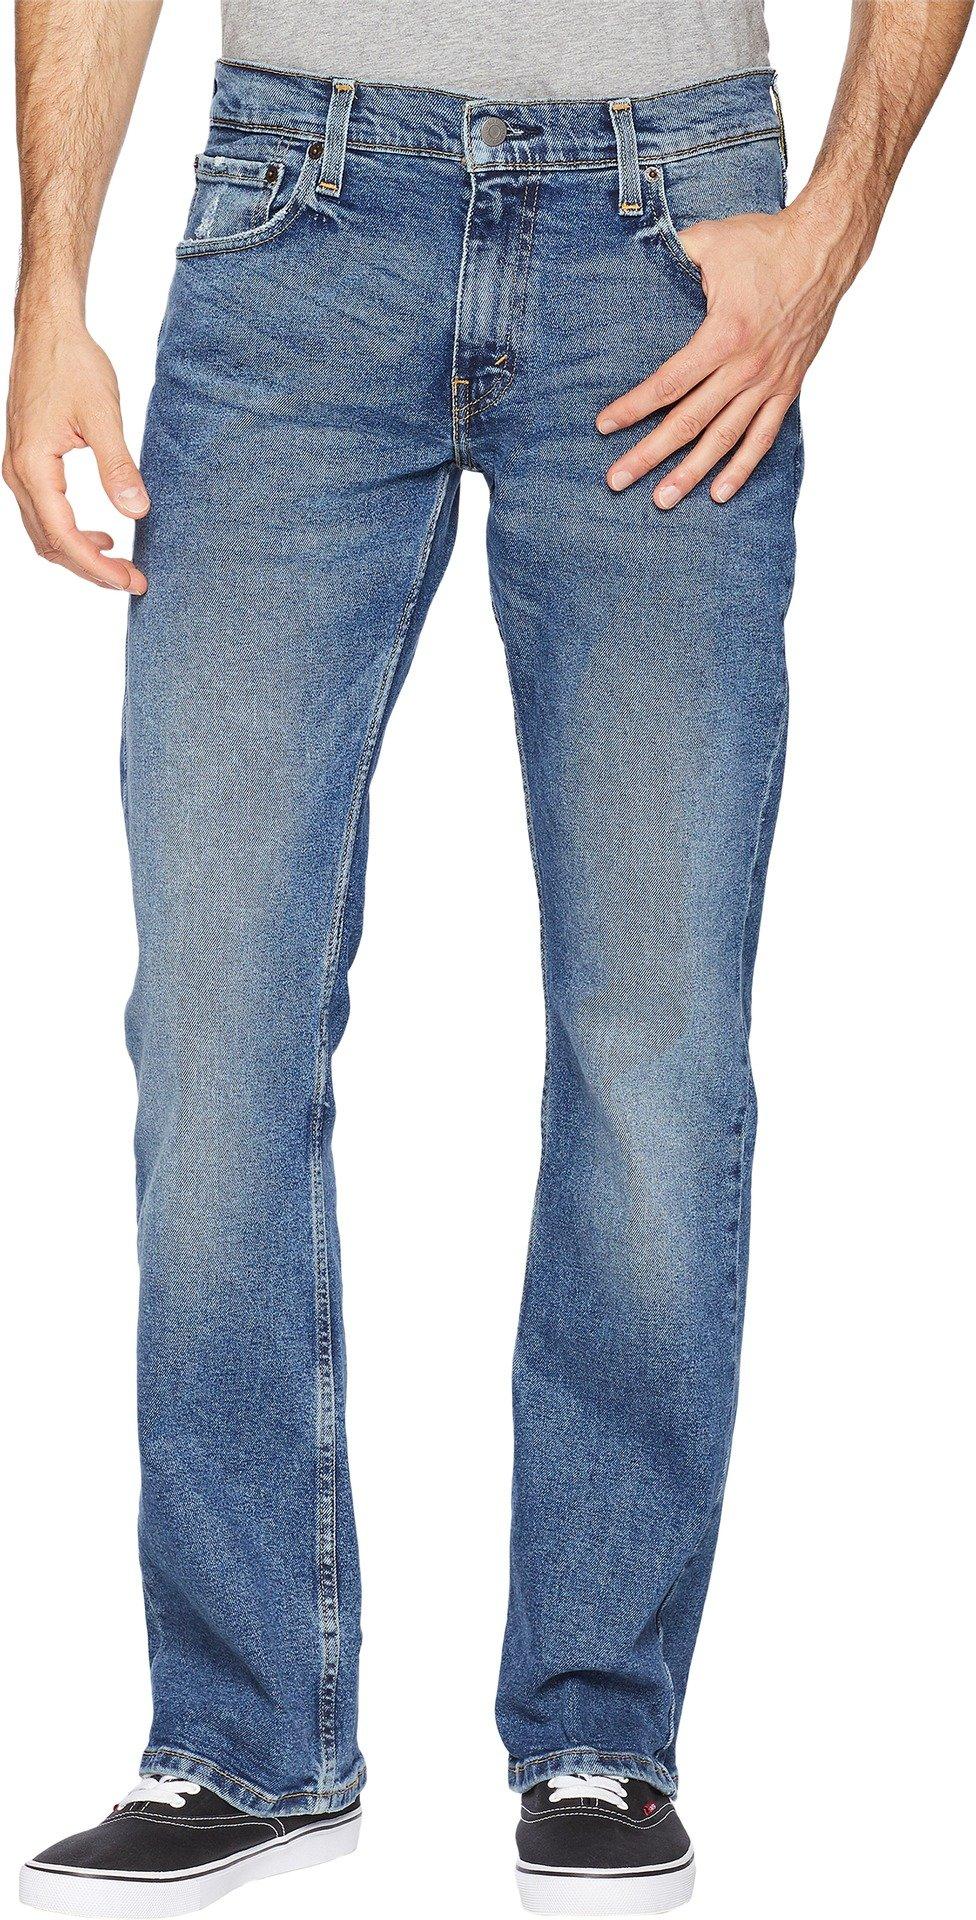 Levi's Men's 527 Slim Bootcut Fit Jean, Afrobeat/Stretch, 33W x 32L